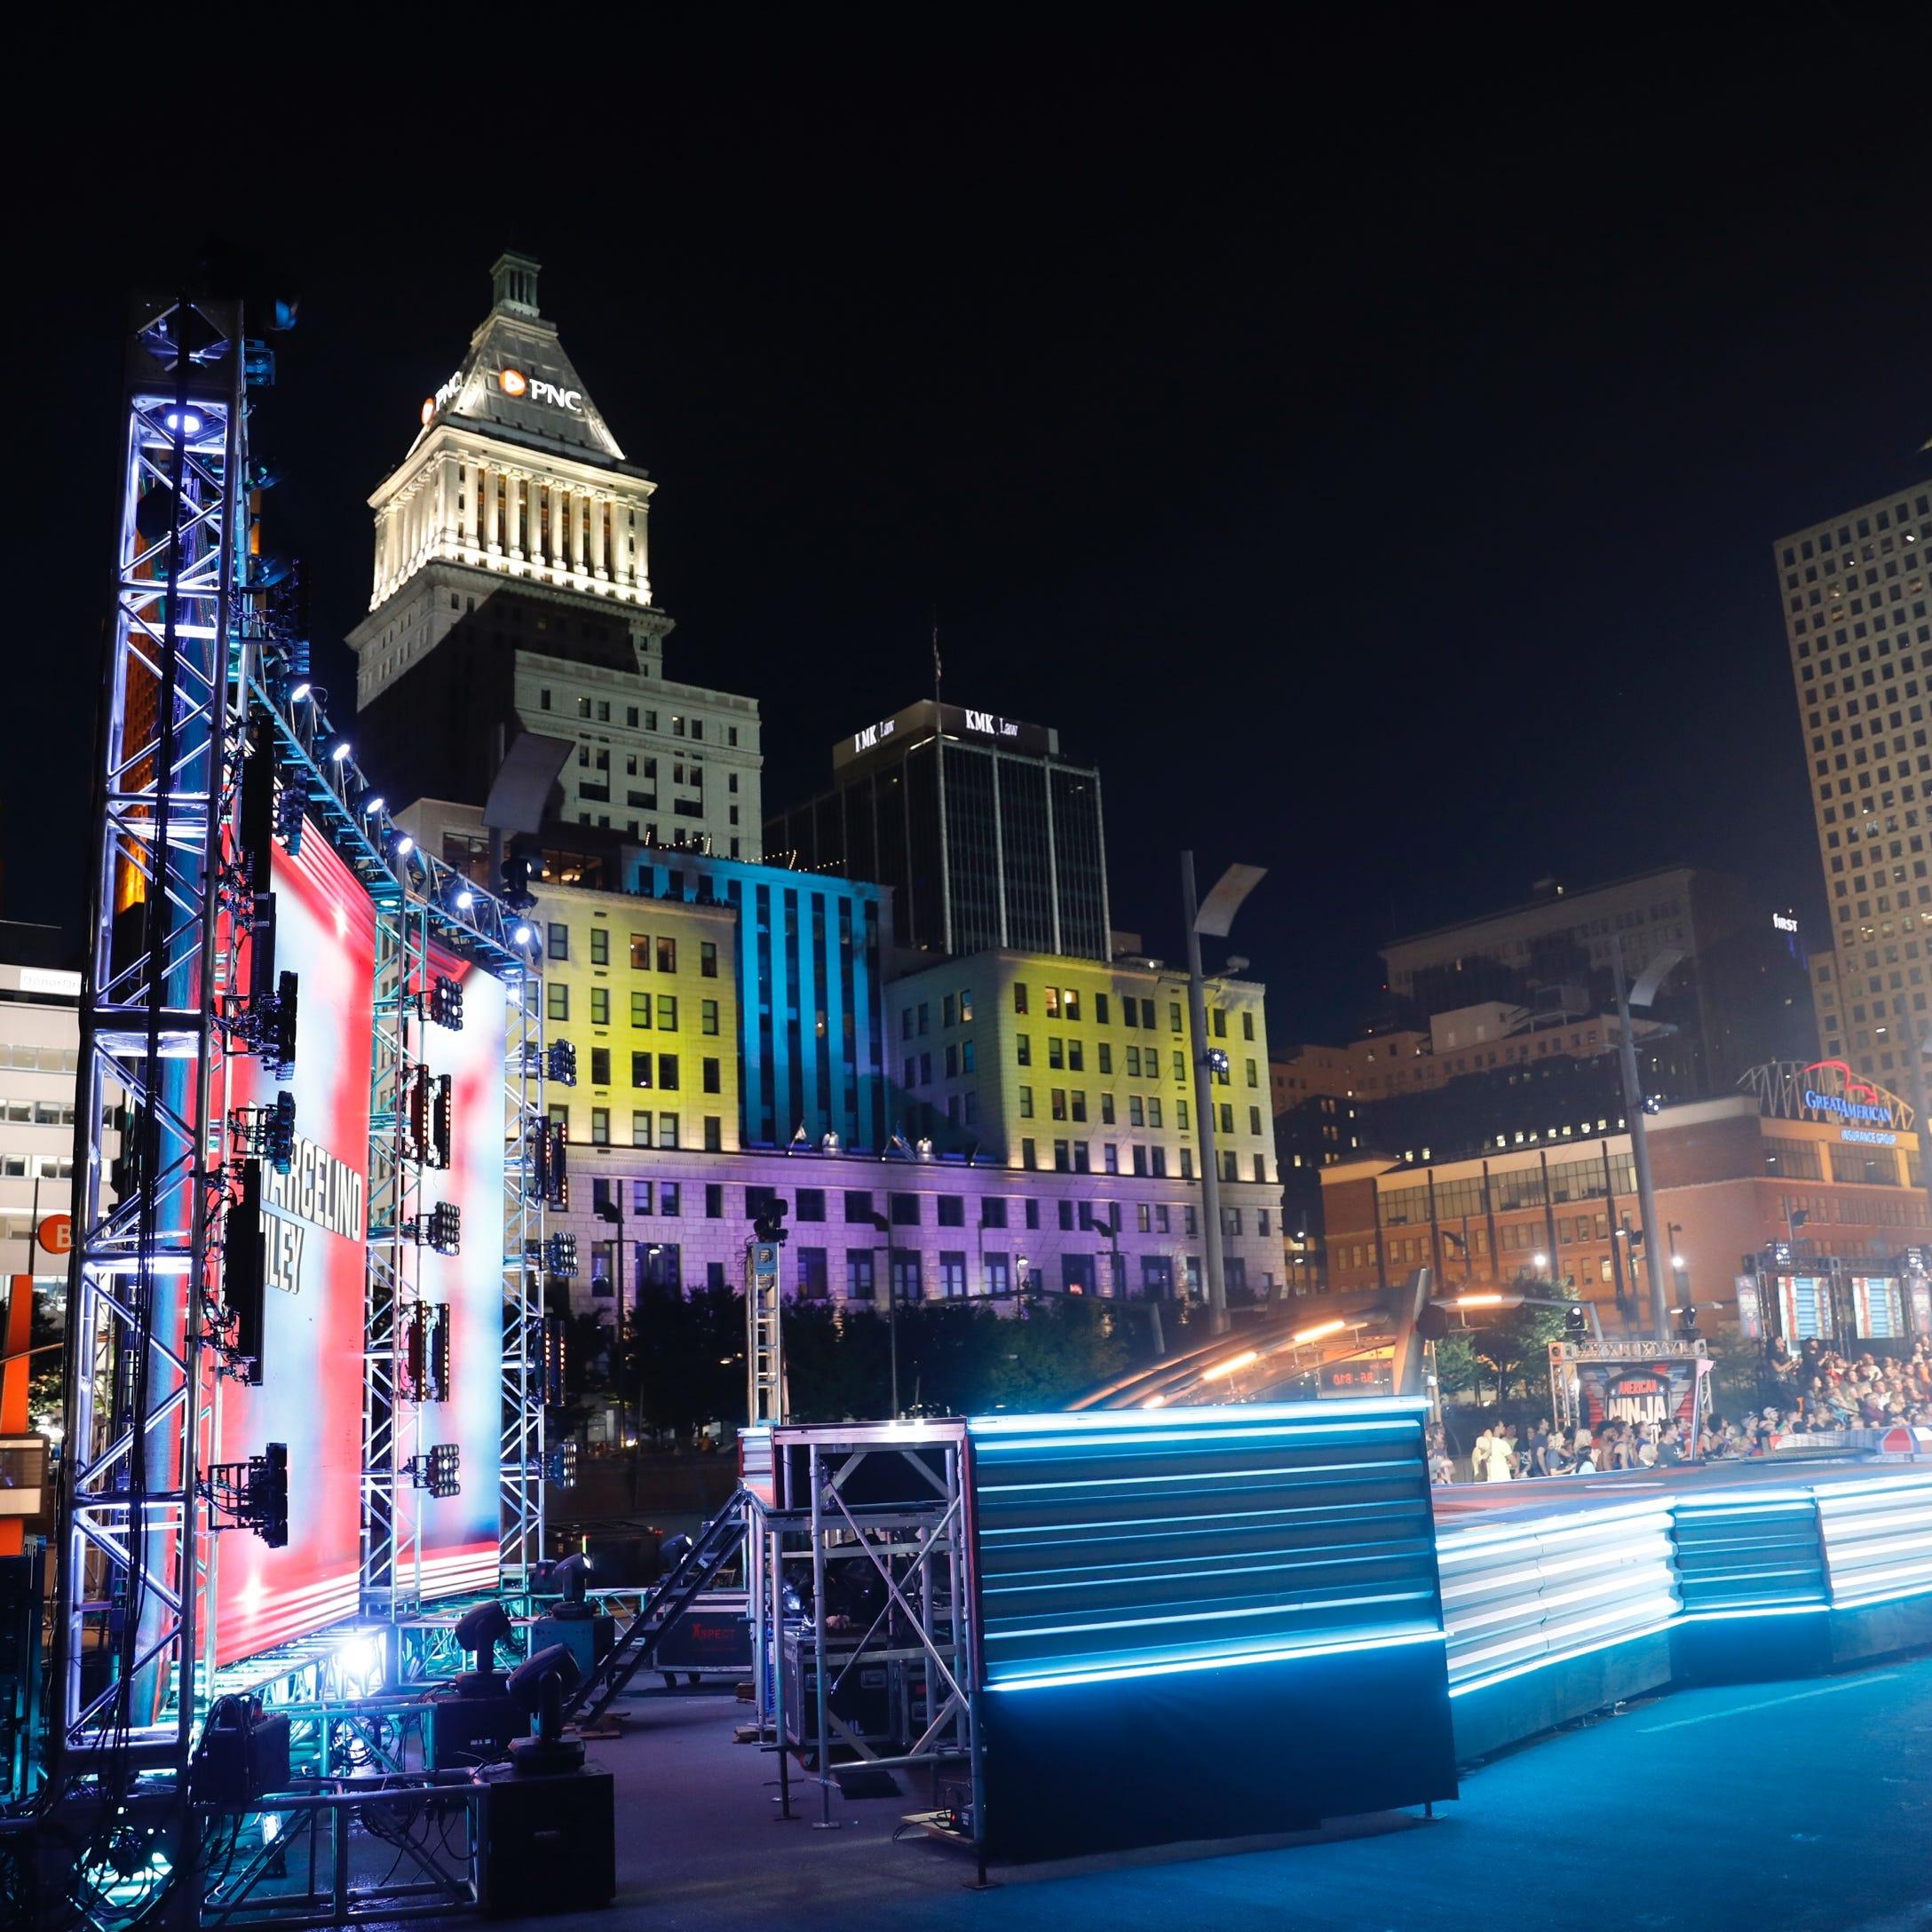 'American Ninja Warrior': Contestants' dreams of glory make a splash in Cincinnati